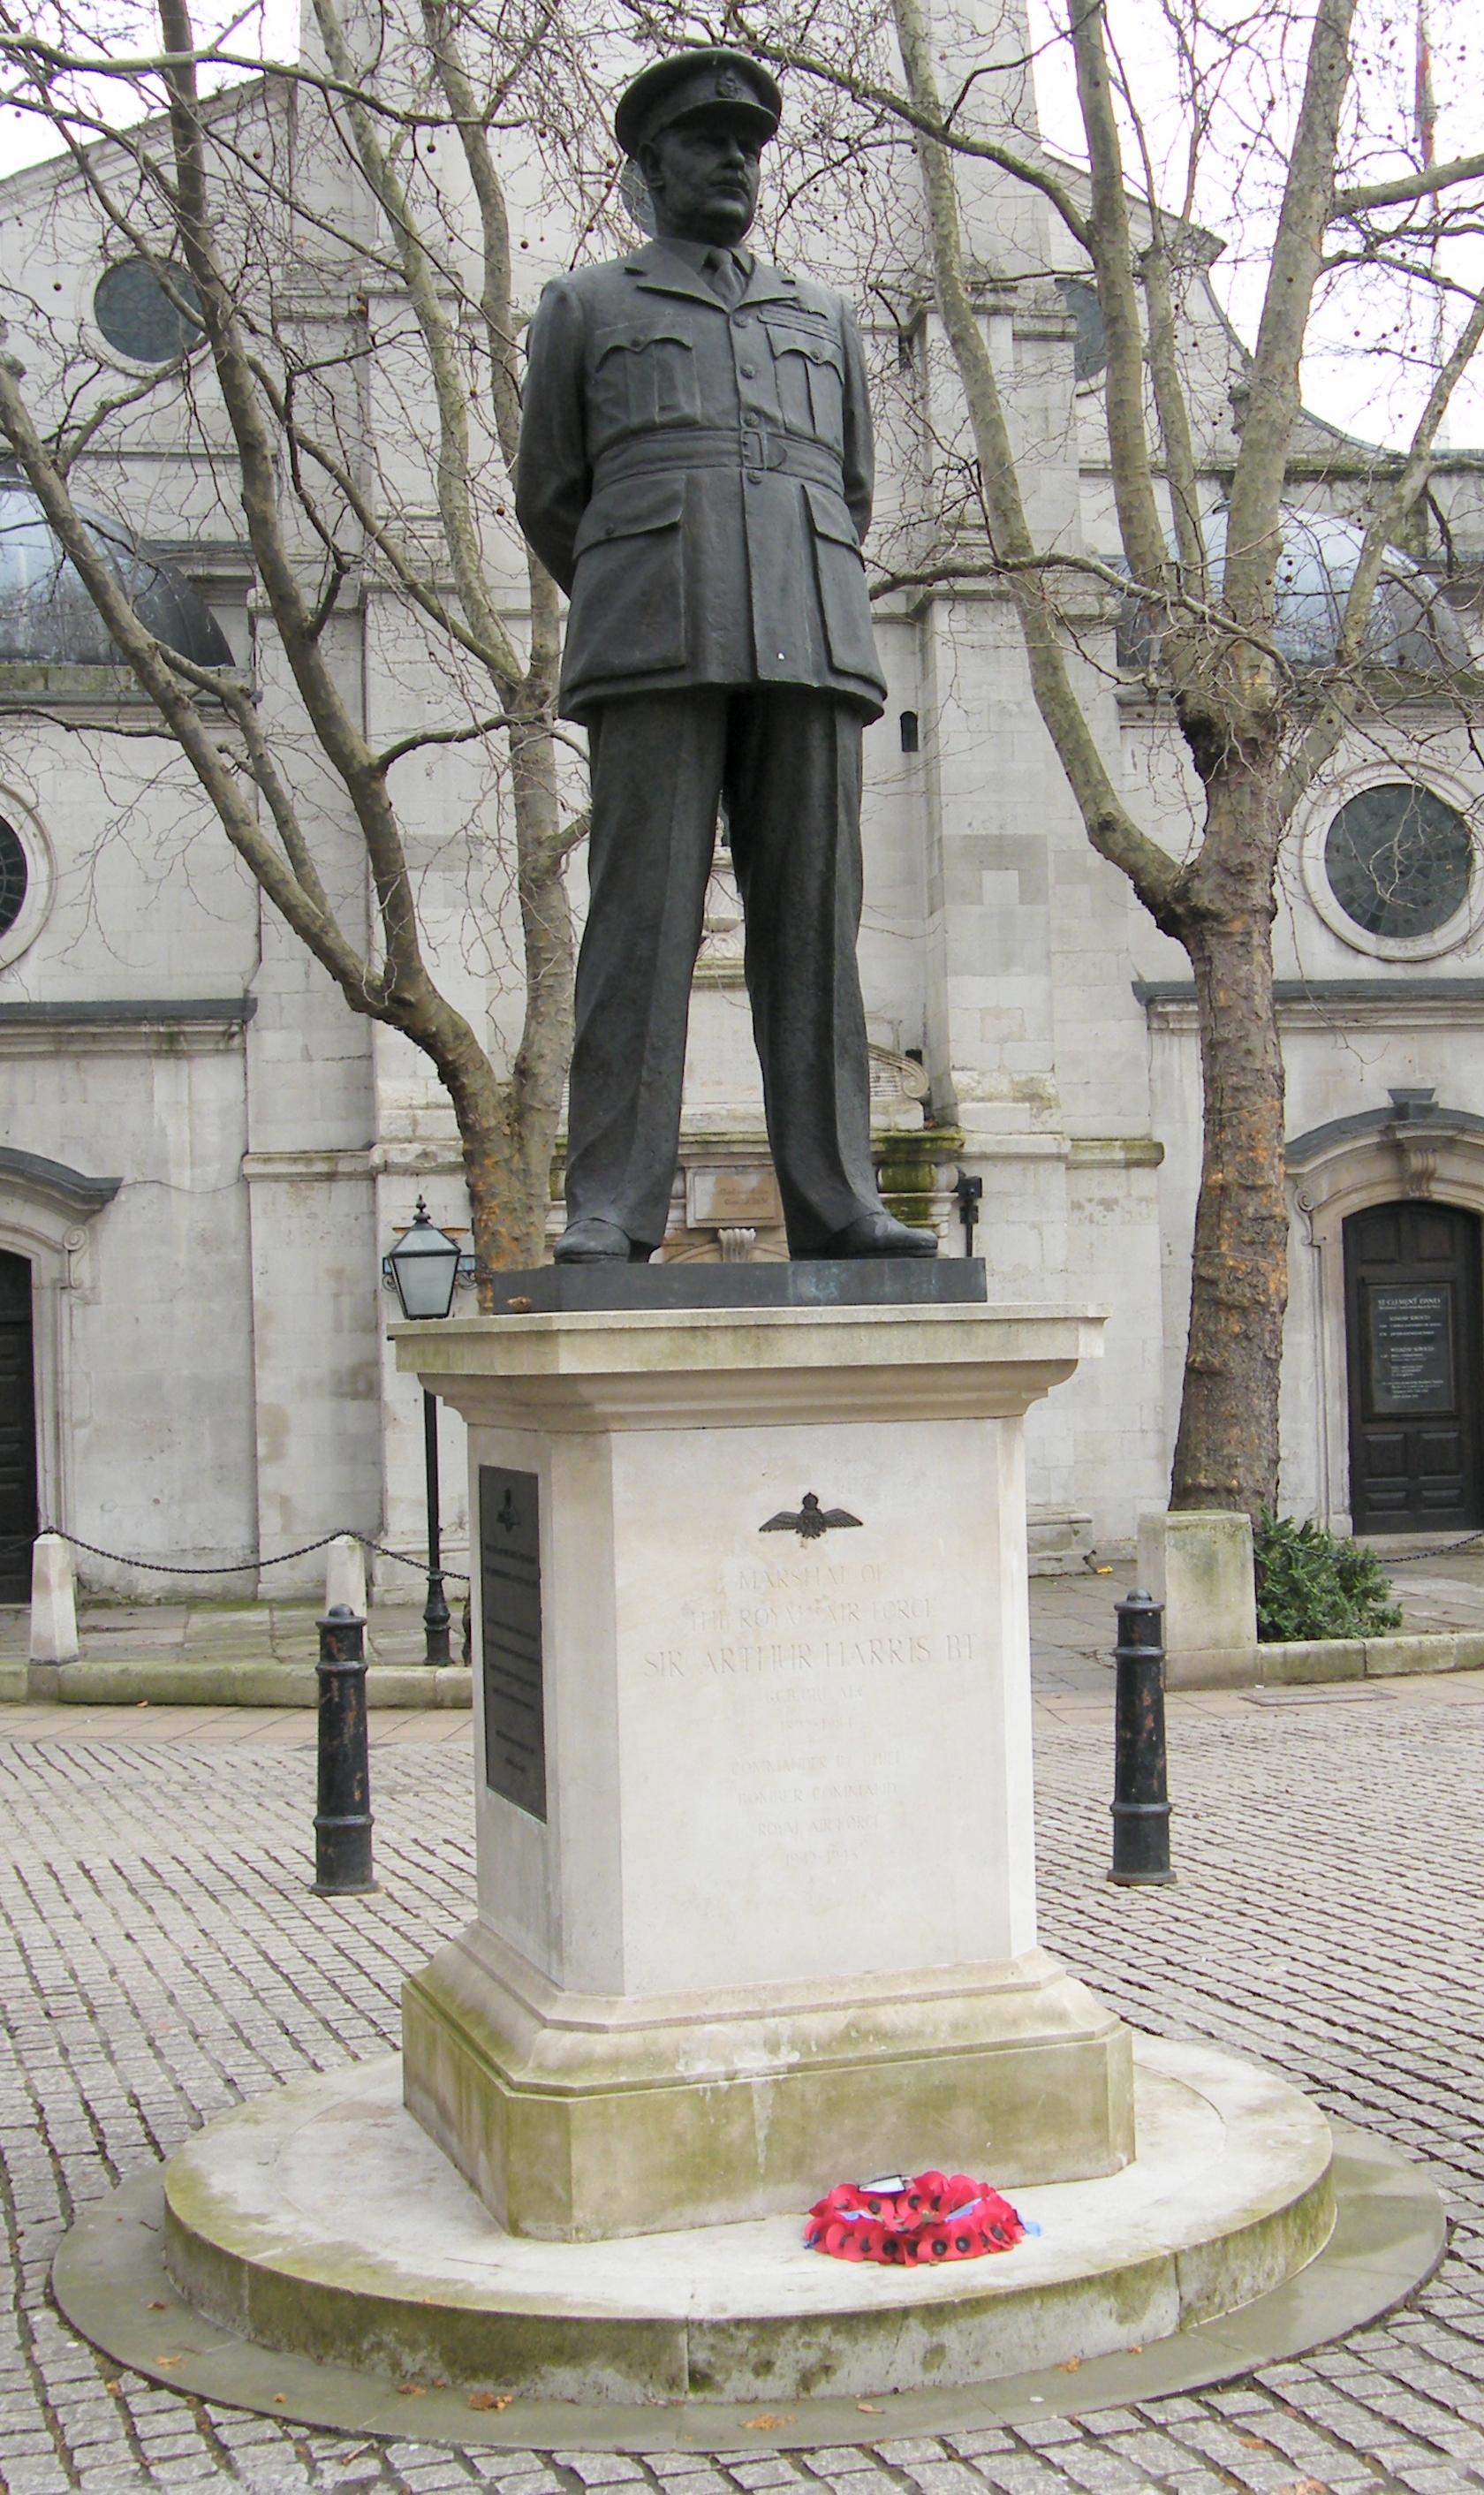 Statue_of_Sir_Arthur_Harris_outside_St_Clement_Danes.jpg